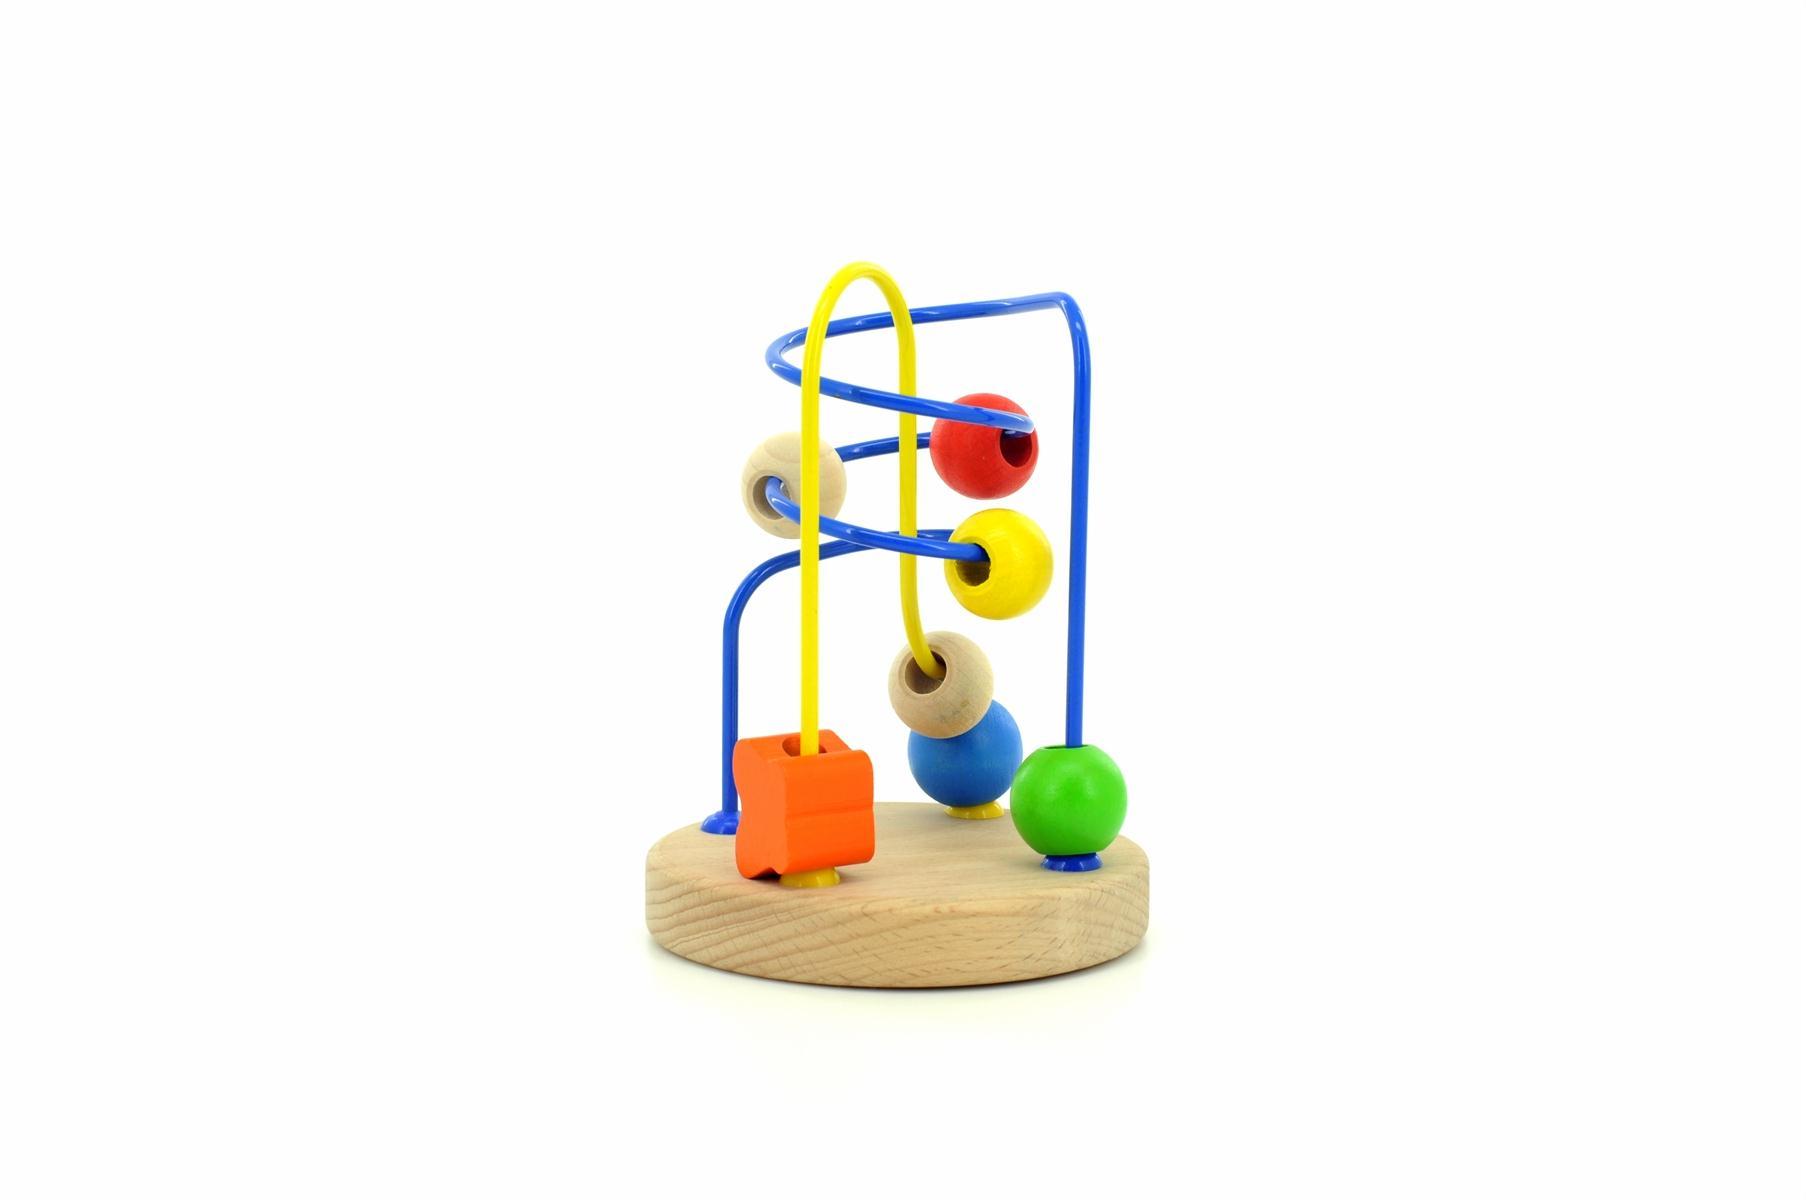 Развивающая игрушка МДИ Лабиринт № 5